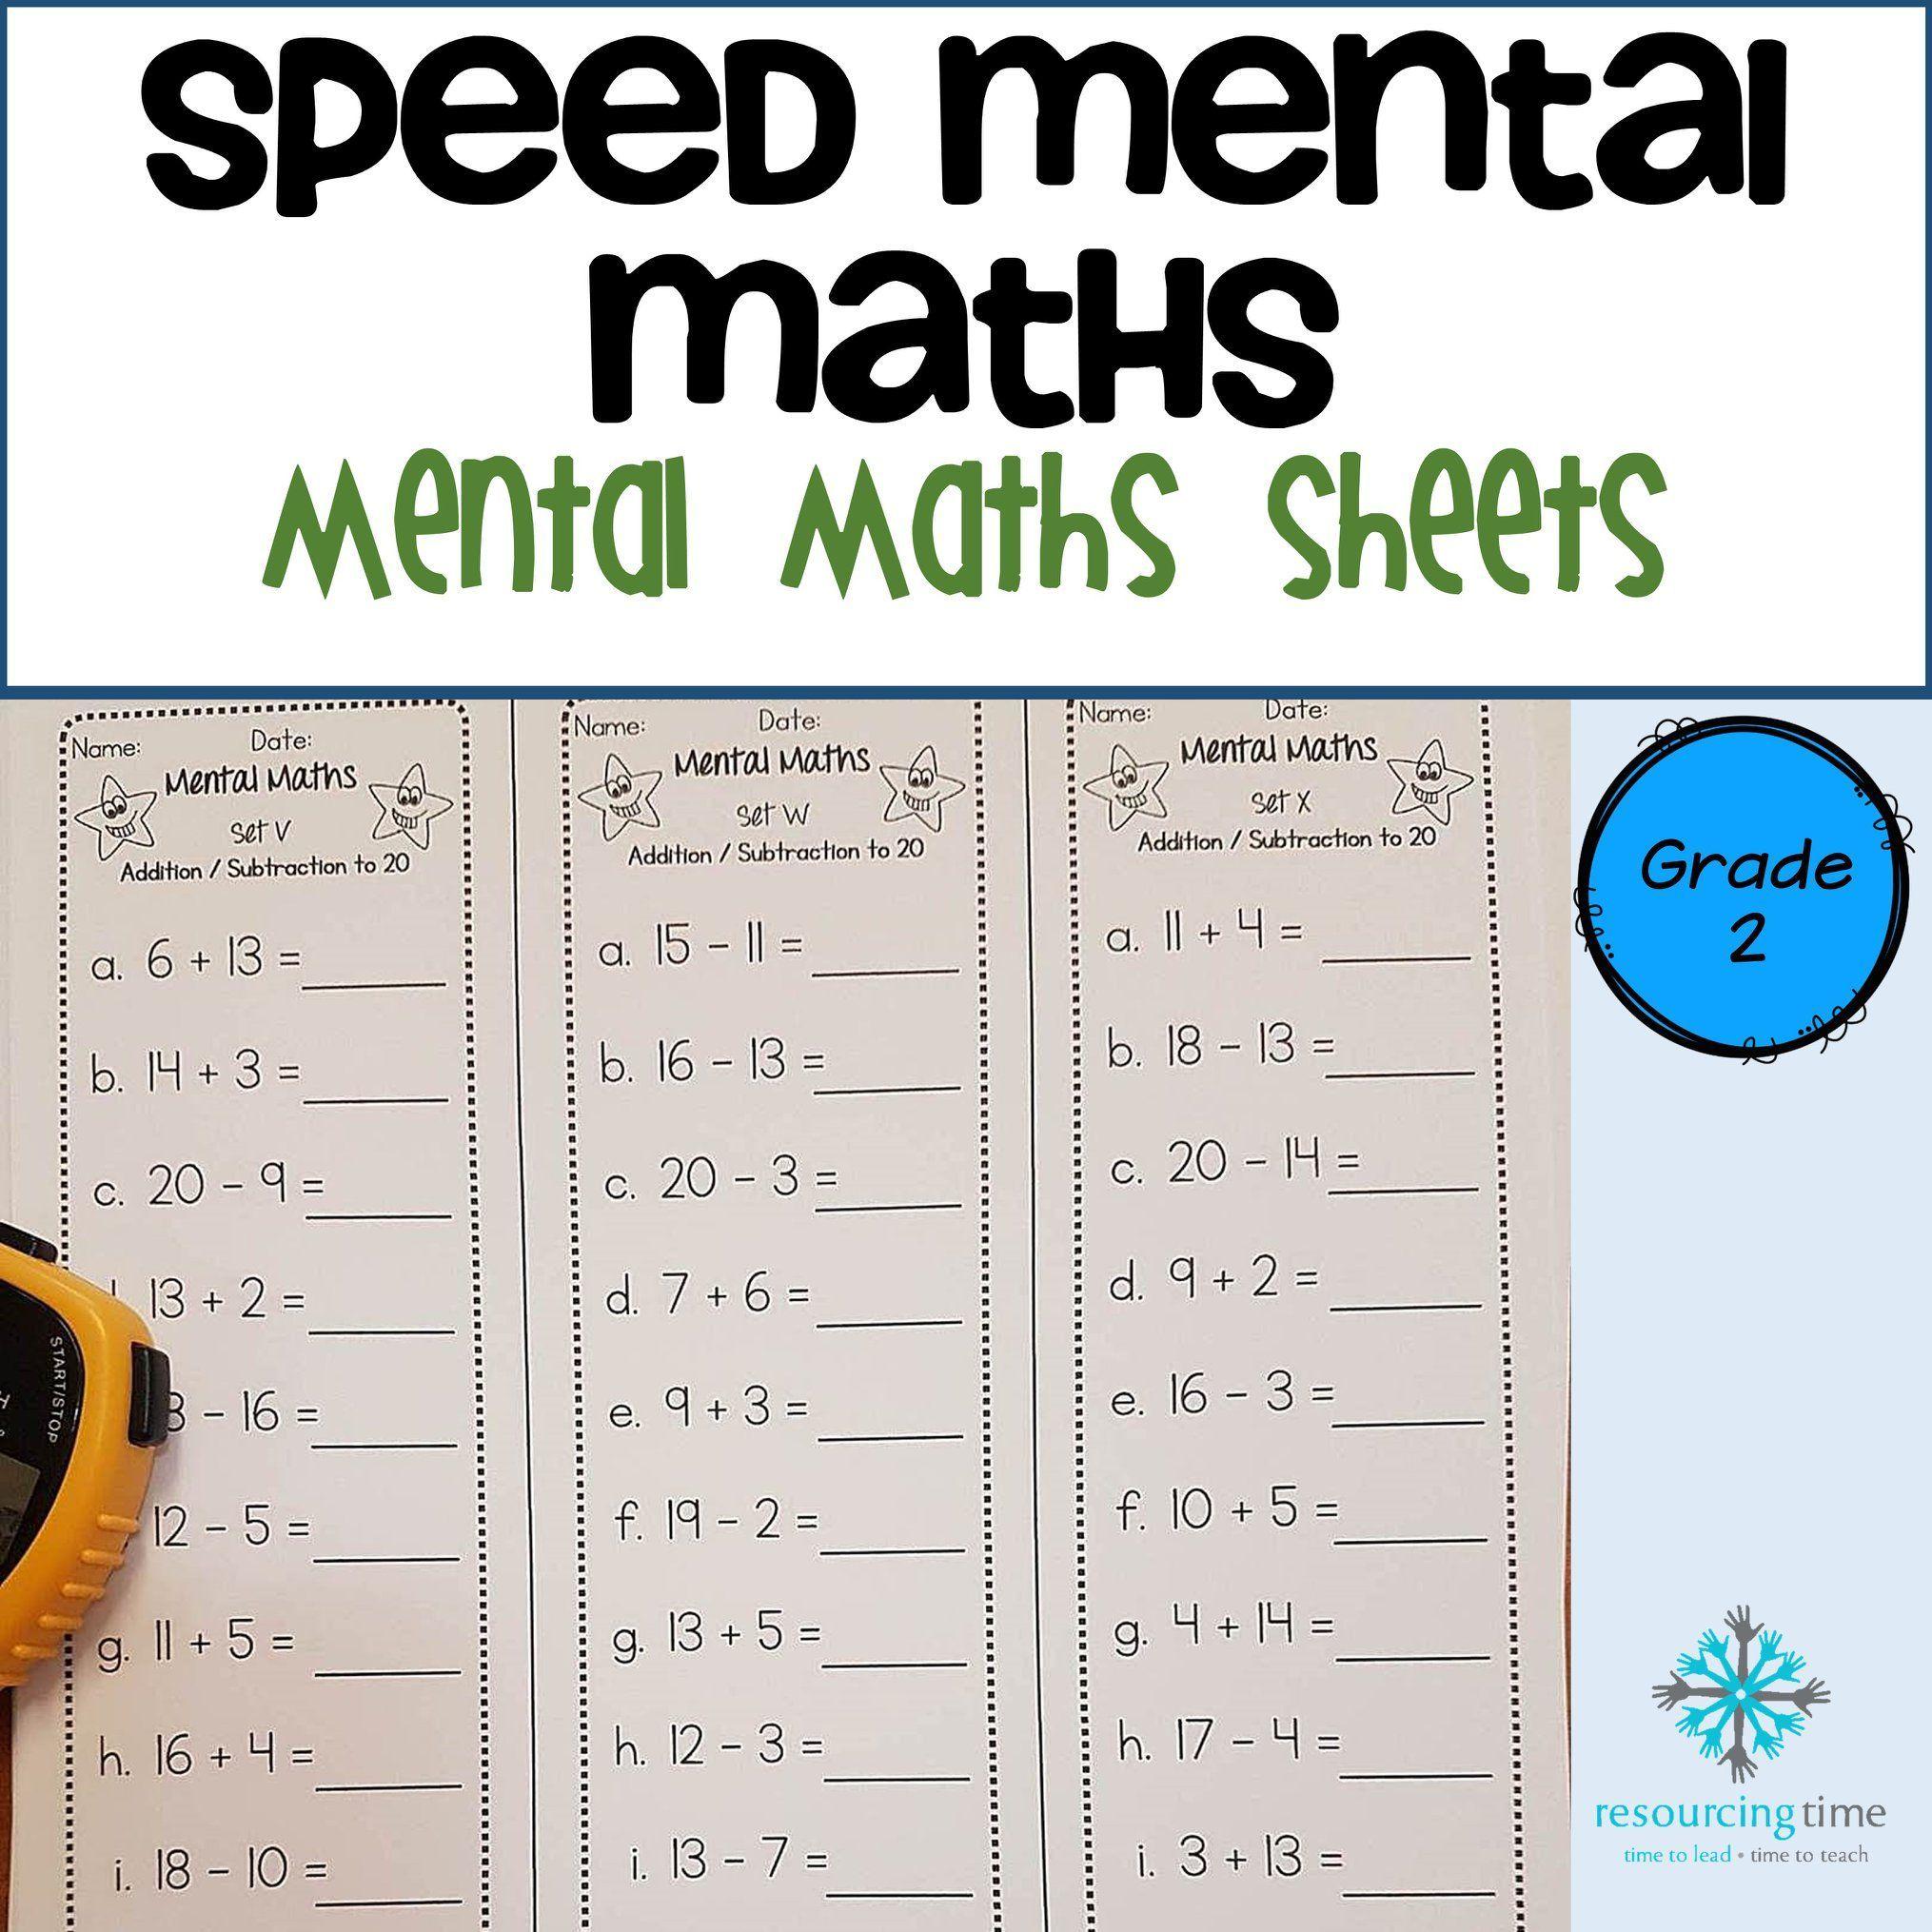 Year 2 Speed Mental Maths Australian Curriculum Mental Math Math Mental Math Strategies Mental math addition activities